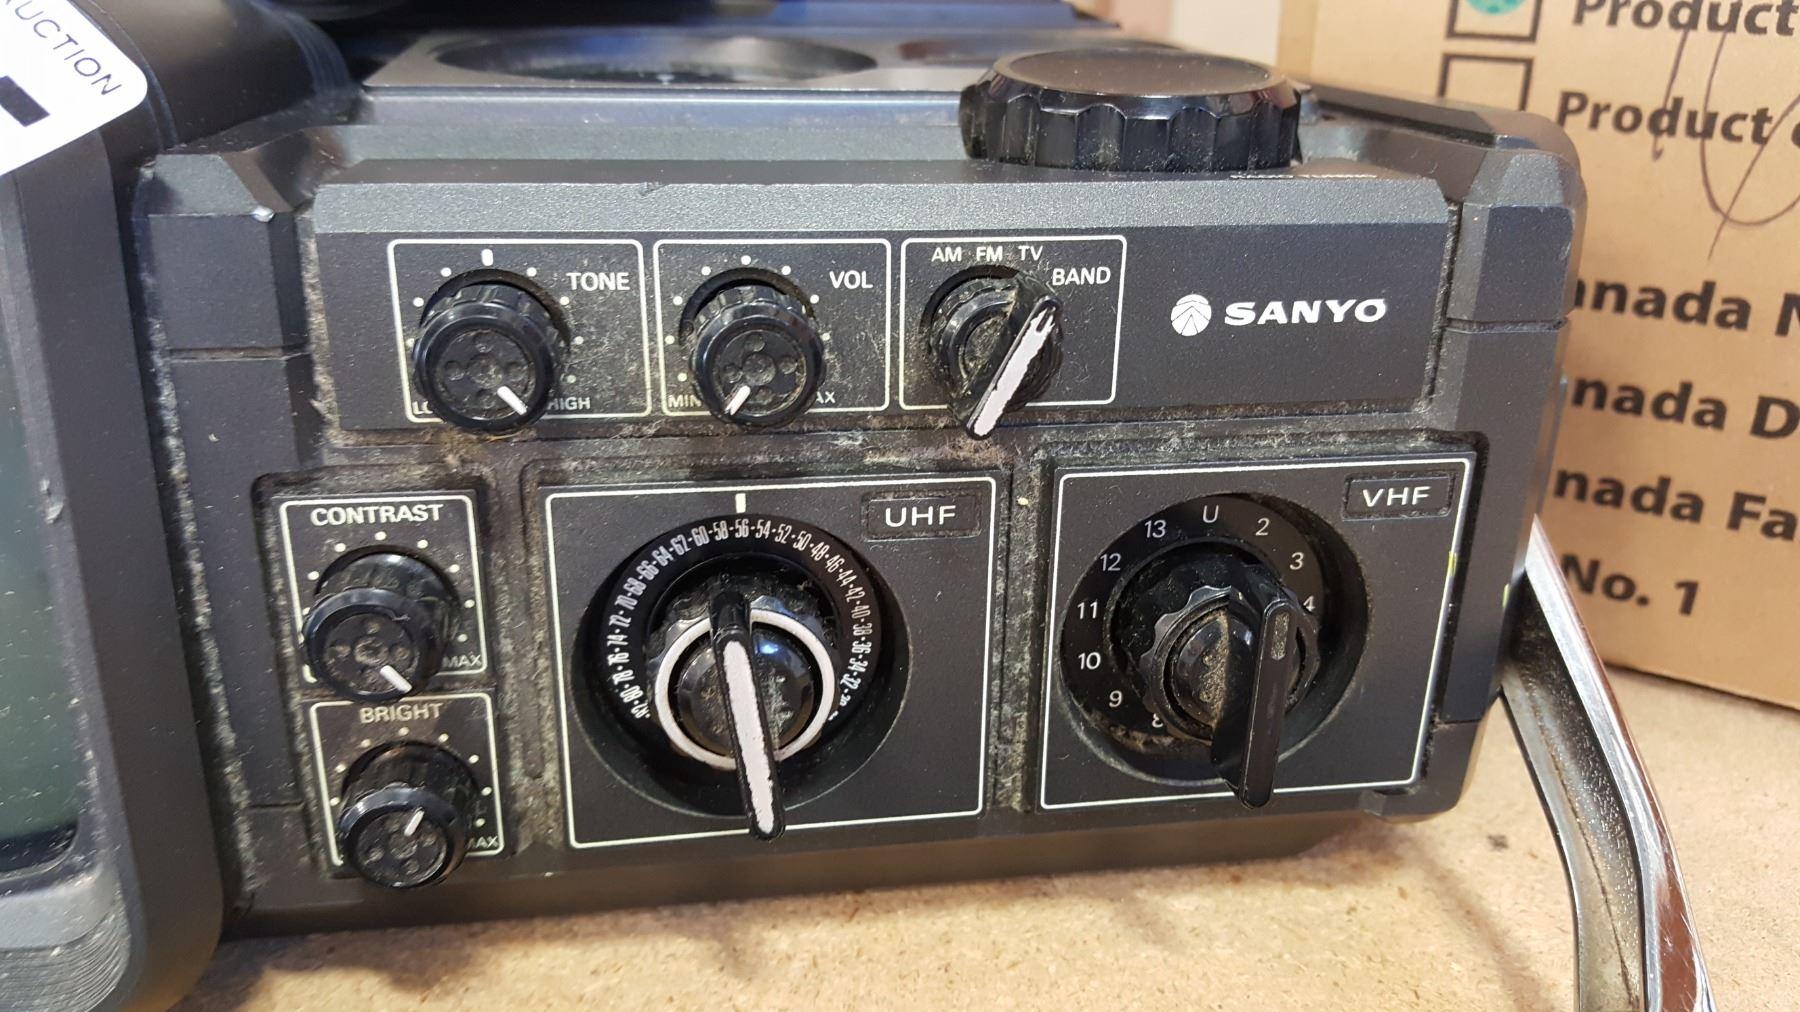 SANYO PORTABLE VINTAGE TV/RADIO